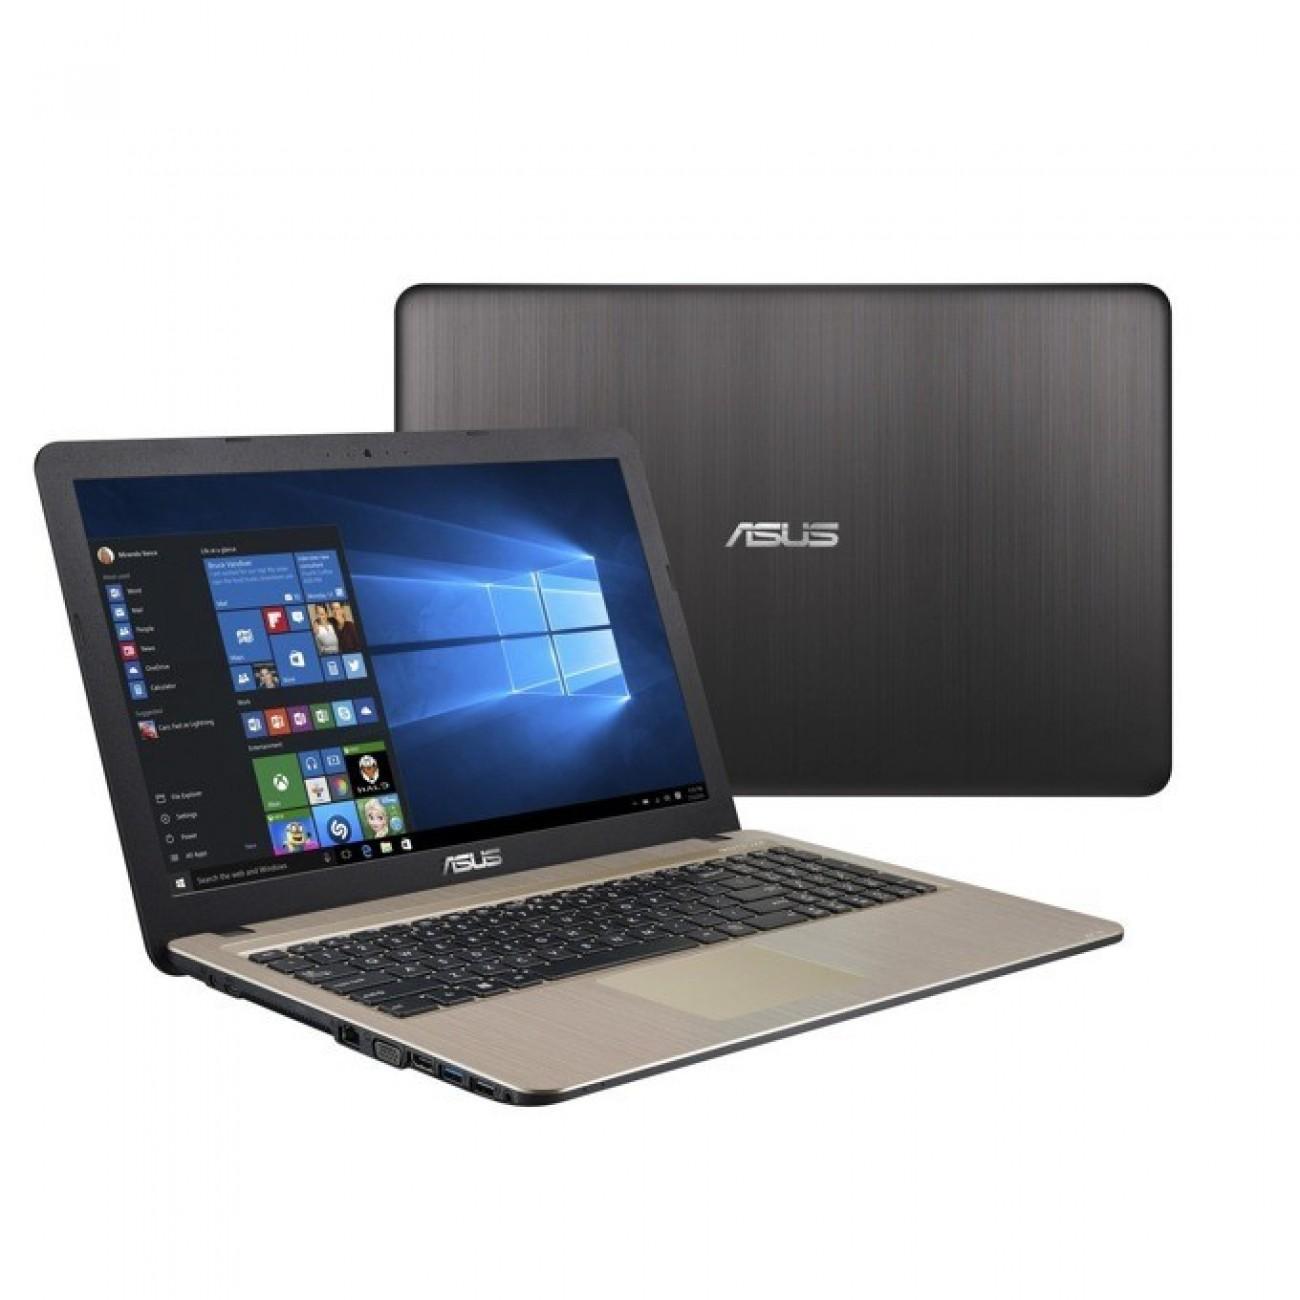 Лаптоп Asus X540UB-GQ041 (90NB0IM1-M00500), двуядрен Skylake Intel Core i3-6006U 2.00 GHz, 15.6 (39.62 cm) HD Glare Display & GF MX110 2GB, (HDMI), 4GB DDR4, 1TB HDD, 1x USB 3.0, Linux, 2.0 kg в Лаптопи -  | Alleop